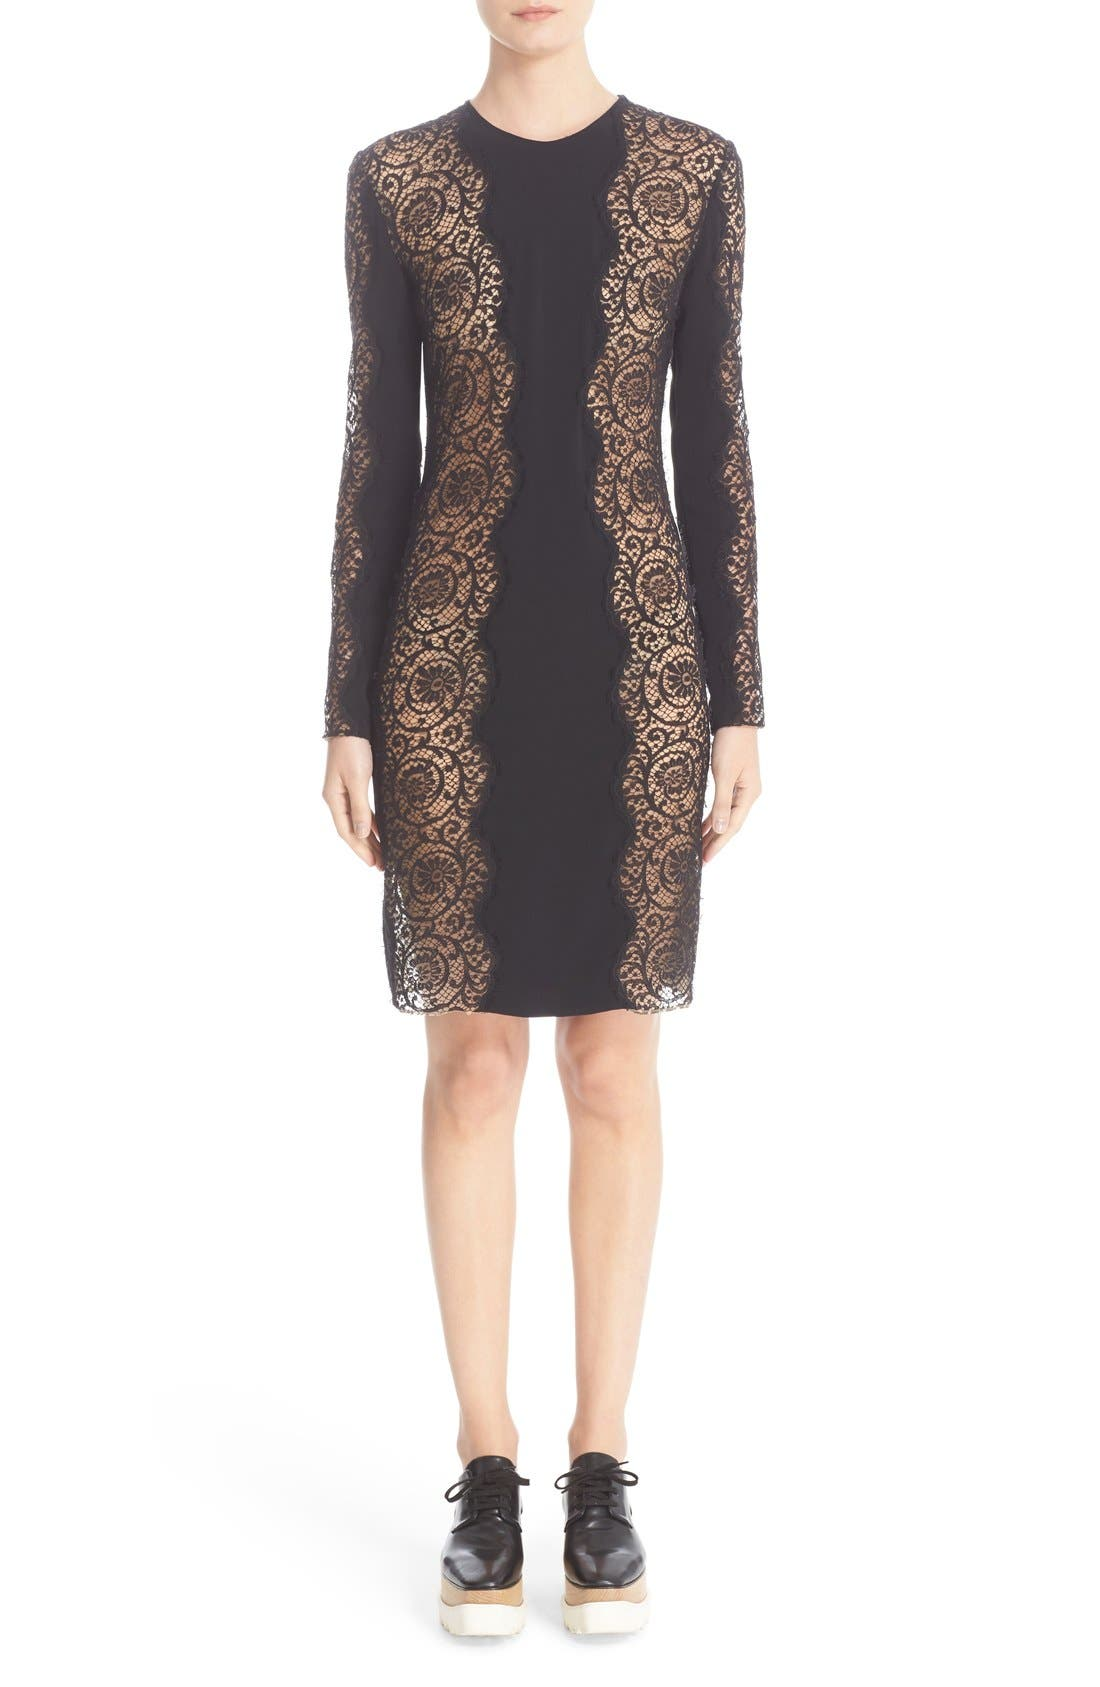 Alternate Image 1 Selected - Stella McCartney Charlie Lace Dress